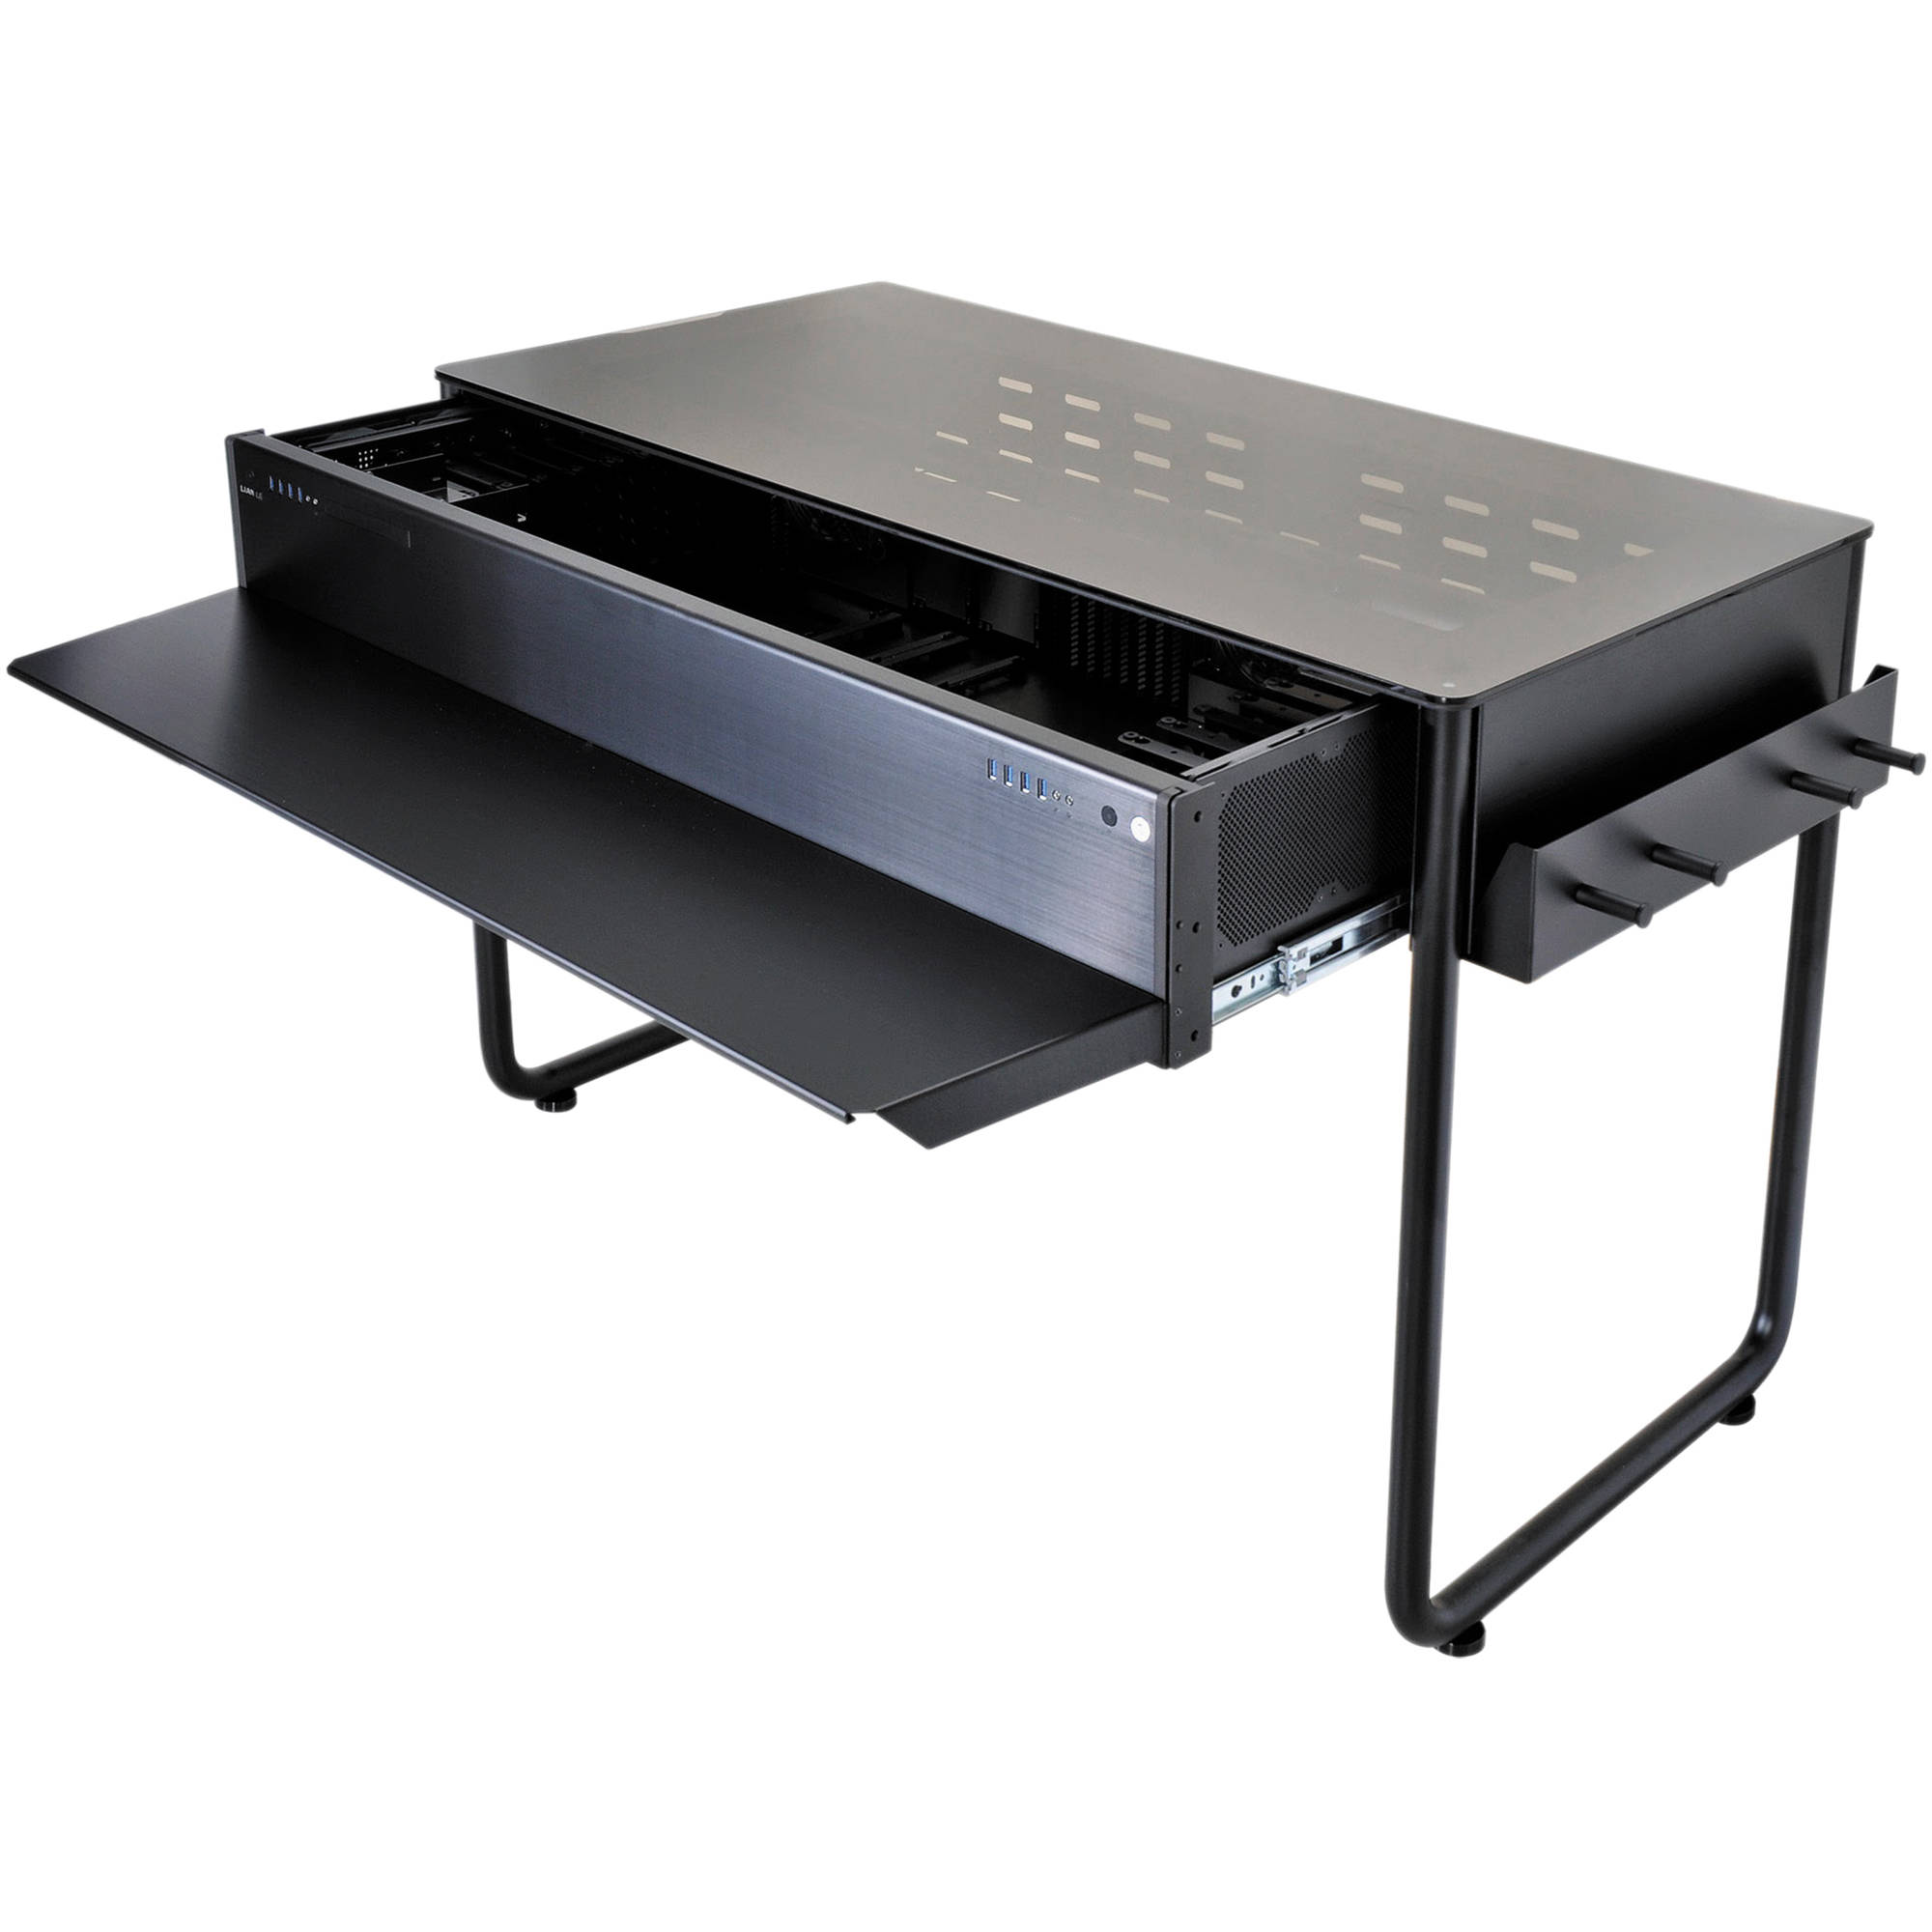 Lian Li Dk 02x Aluminum Computer Desk Black B Amp H Photo